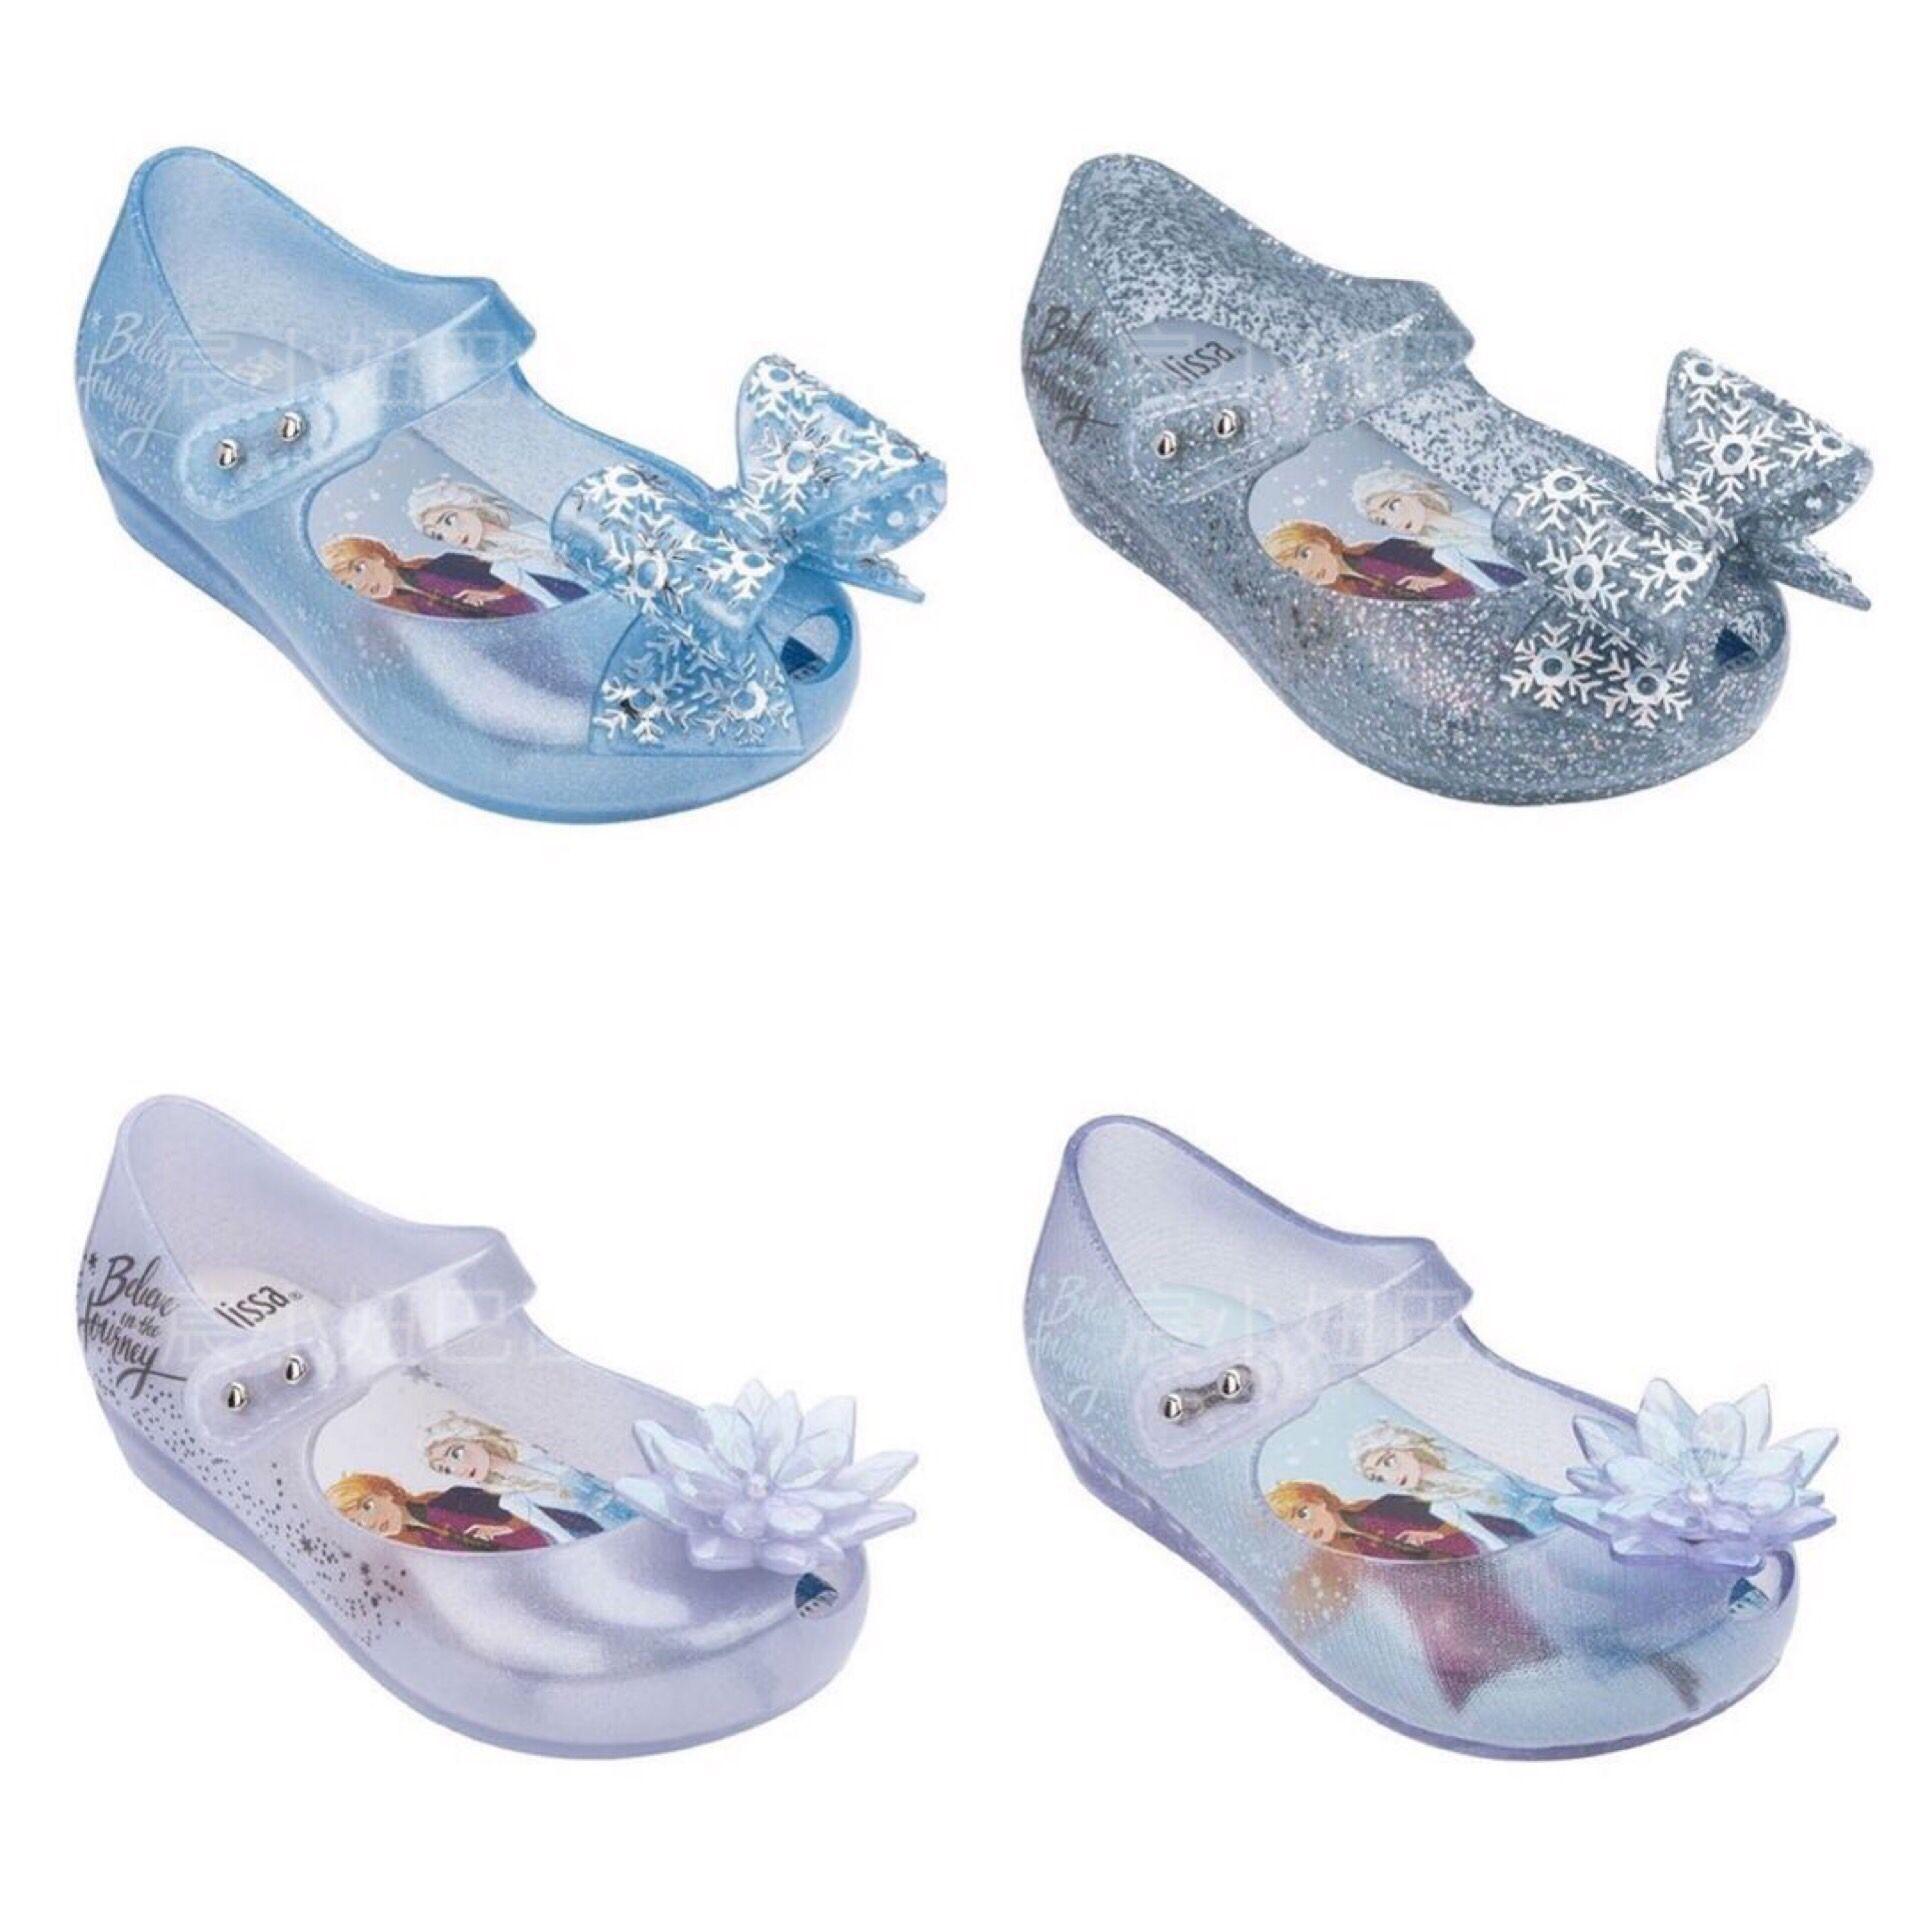 Mini Melissa Ultragirl 2020 Original Girl Jelly Sandals Butterfly Knot Kids Sandals Children Beach Shoes Non-slip Meliss SH19111